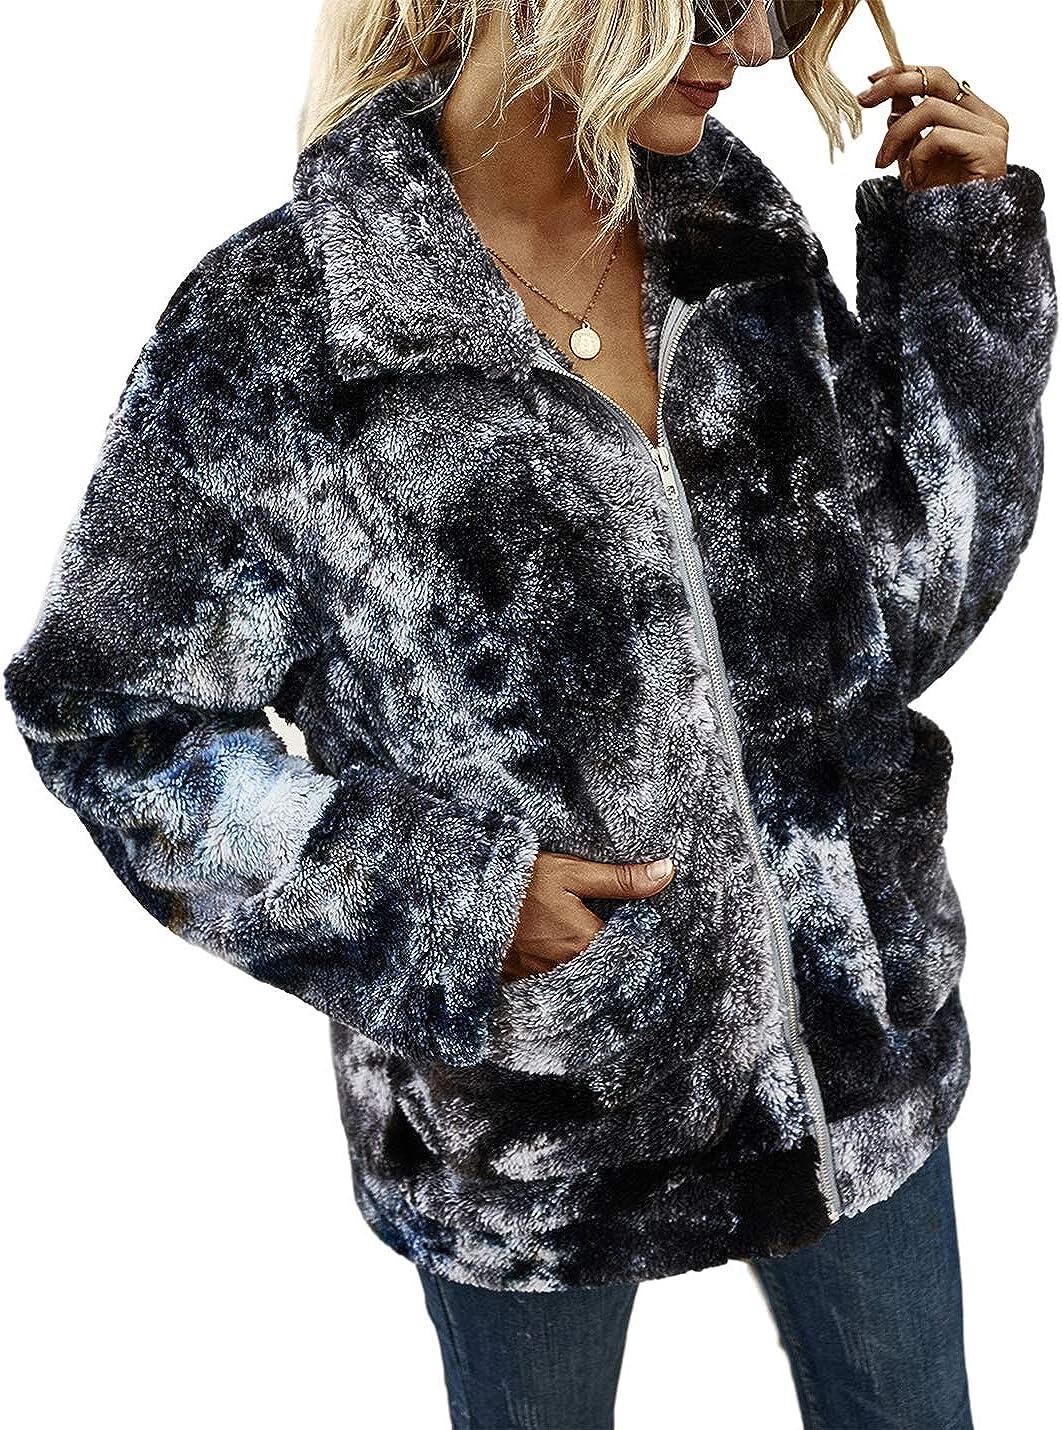 Uaneo Womens Tie Dye Fleece Casual Loose Lapel Zip Up Long Sleeve Jacket Coat(Black-S)